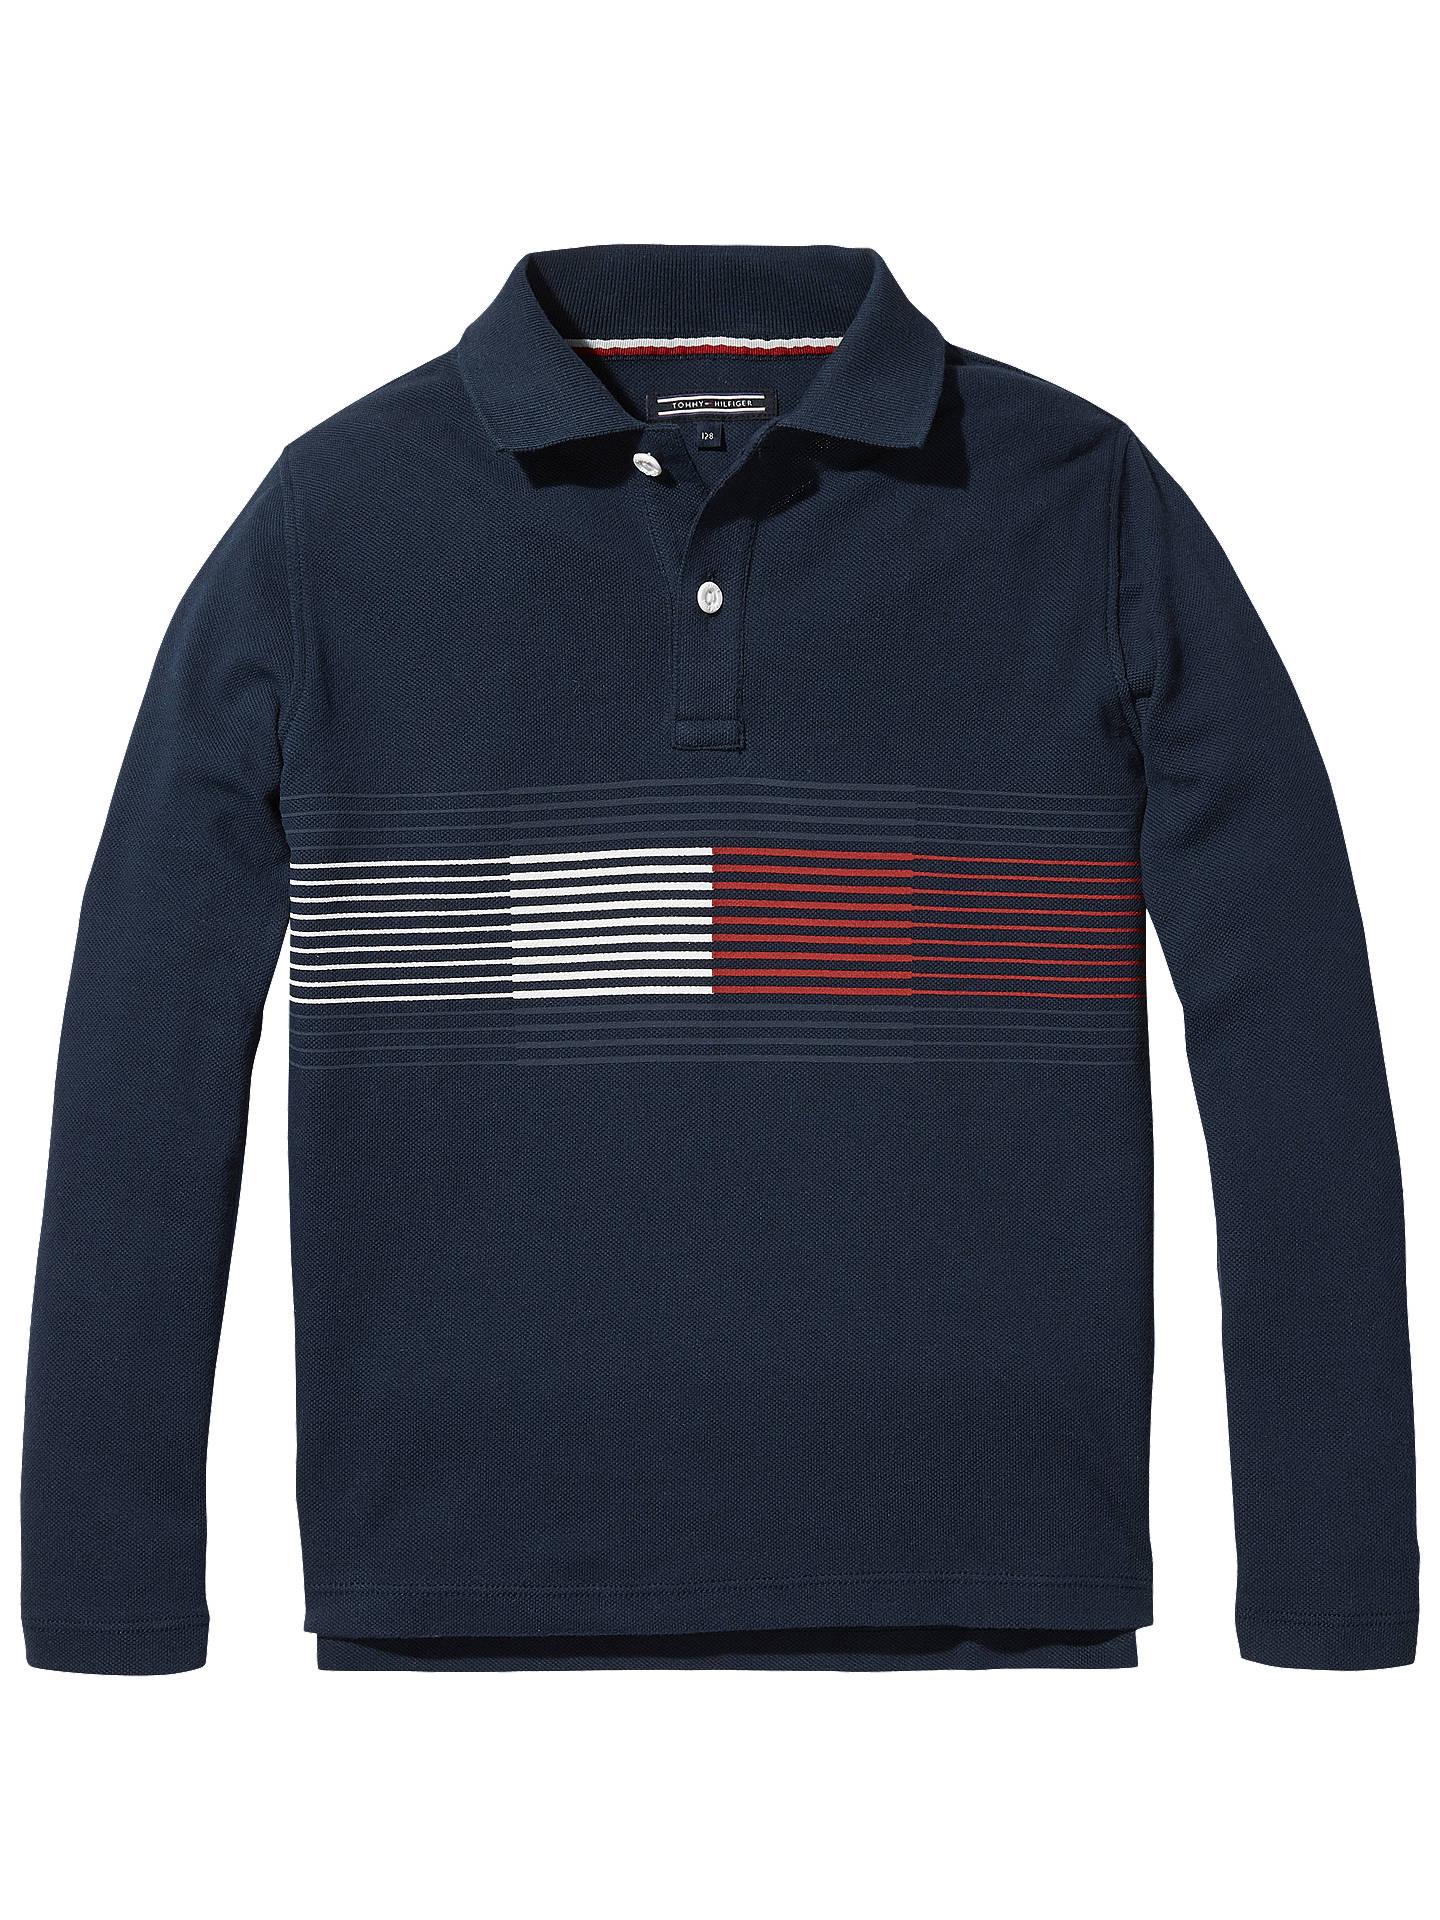 Navy Tommy Hilfiger Tommy Boys Polo Shirt